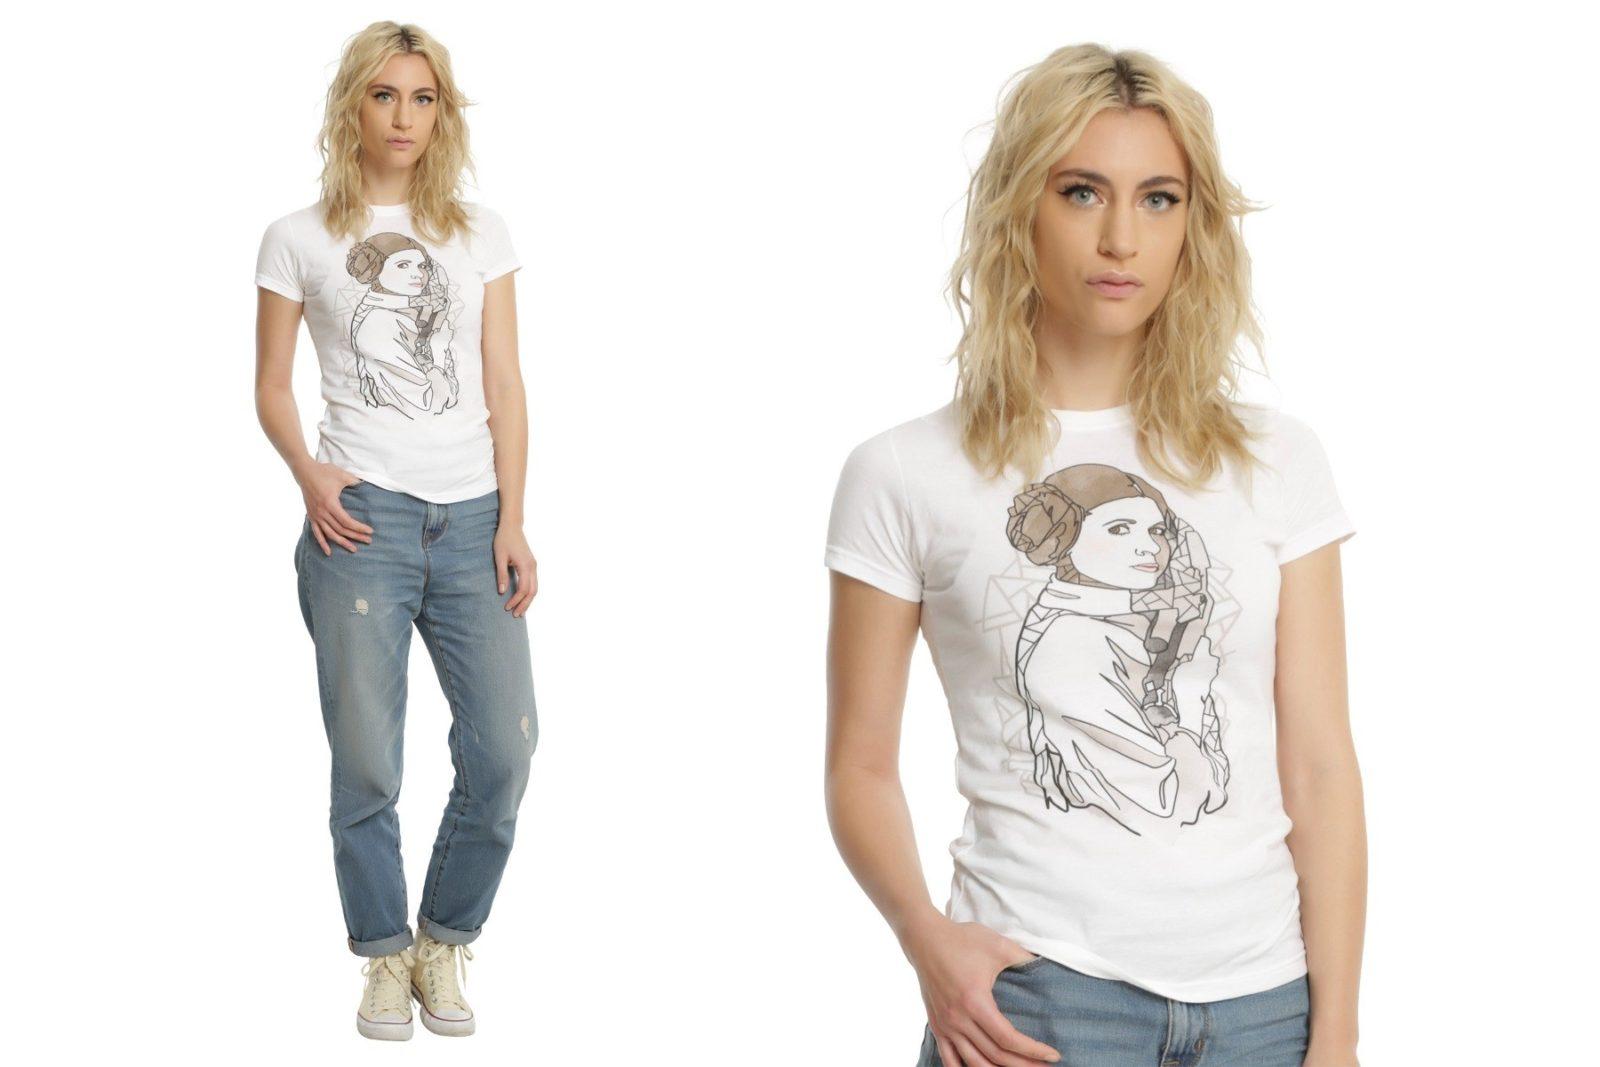 New women's Princess Leia t-shirt at Hot Topic